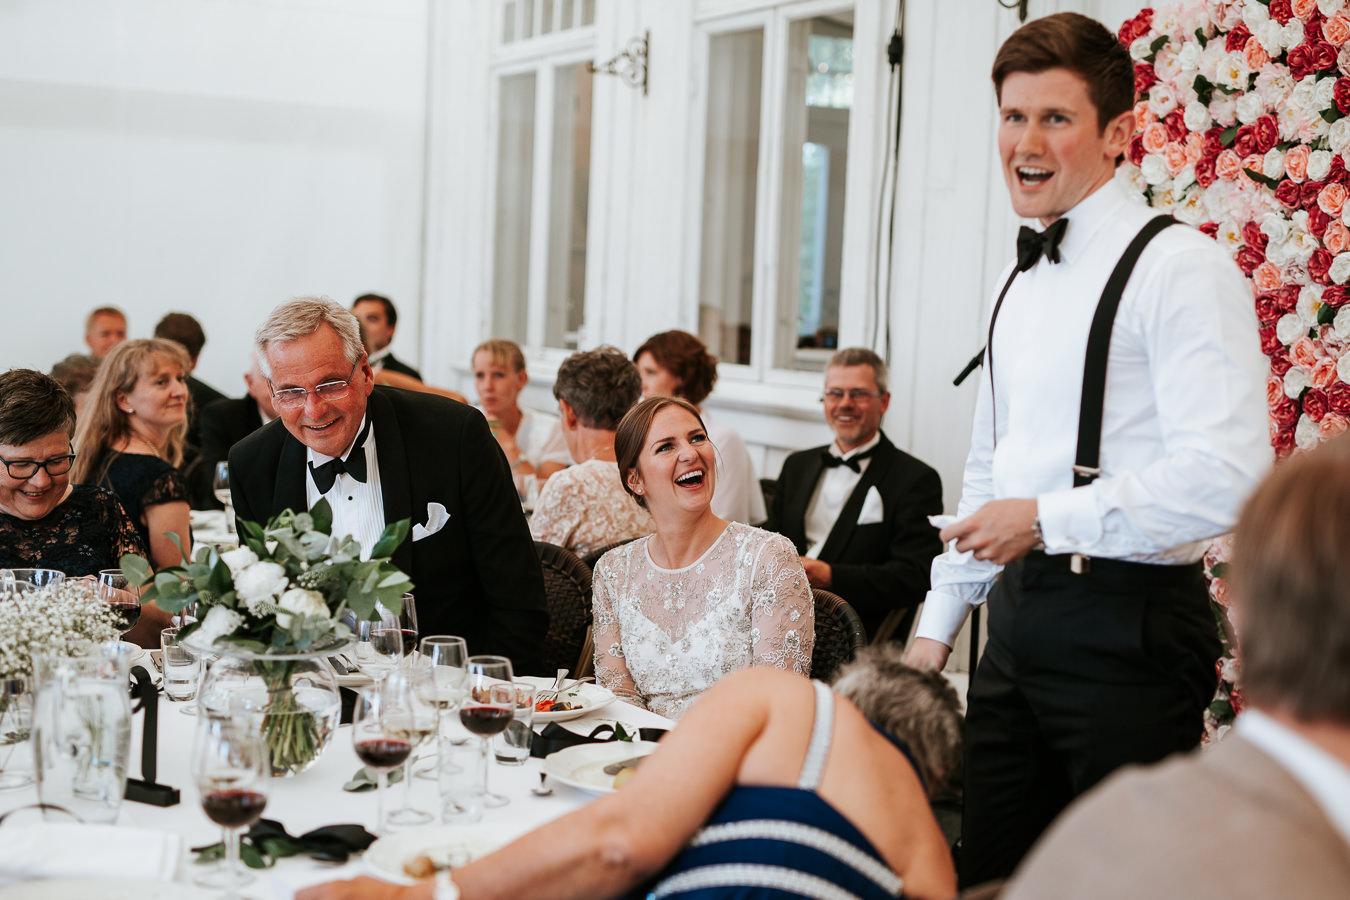 Bryllup-Hellviktangen-fotograf-tvedt-160.jpg